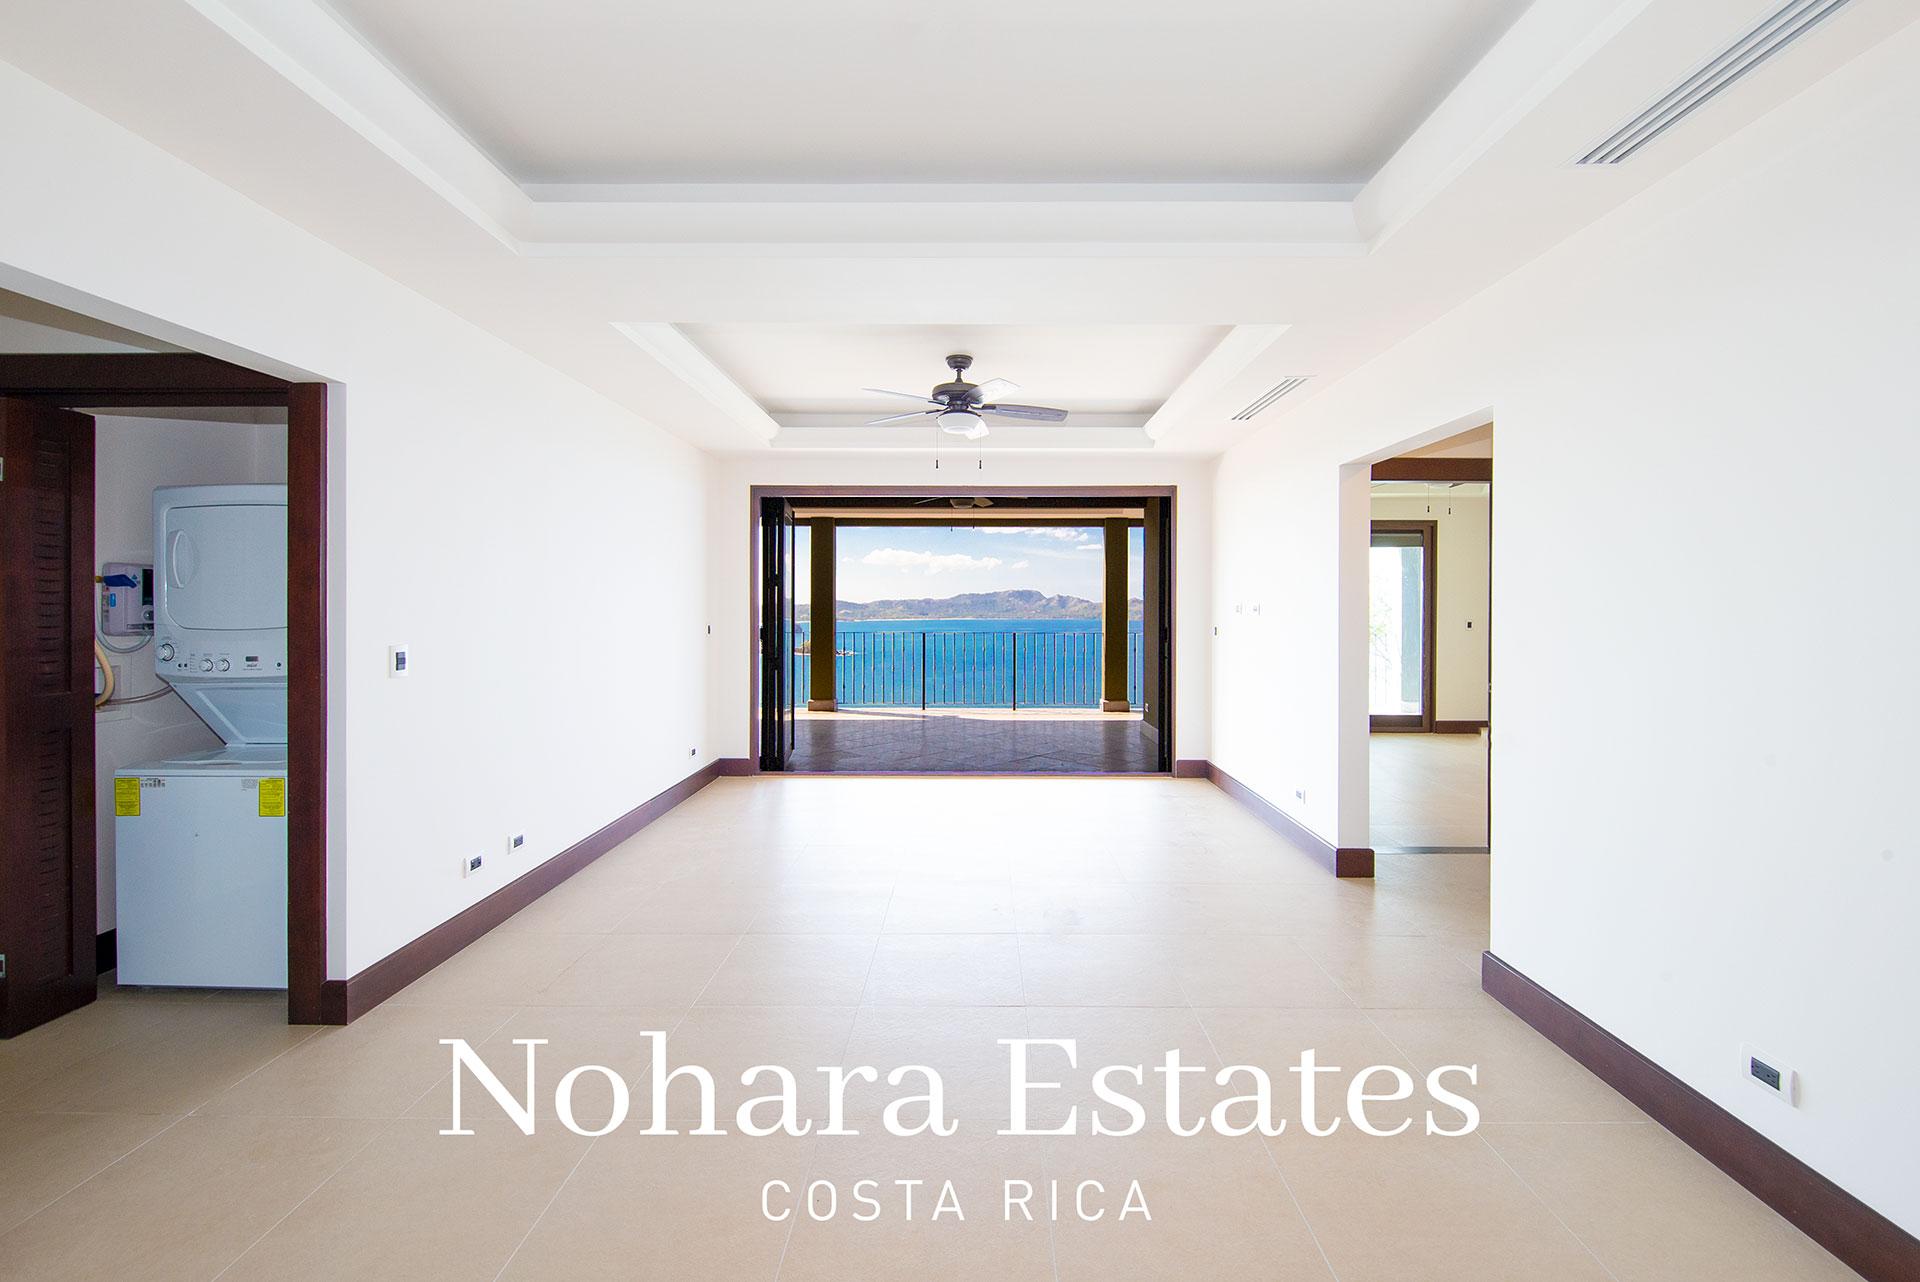 Nohara Estates Costa Rica 360 Esplendor Pacifico Playa Flamingo Penthouse 9